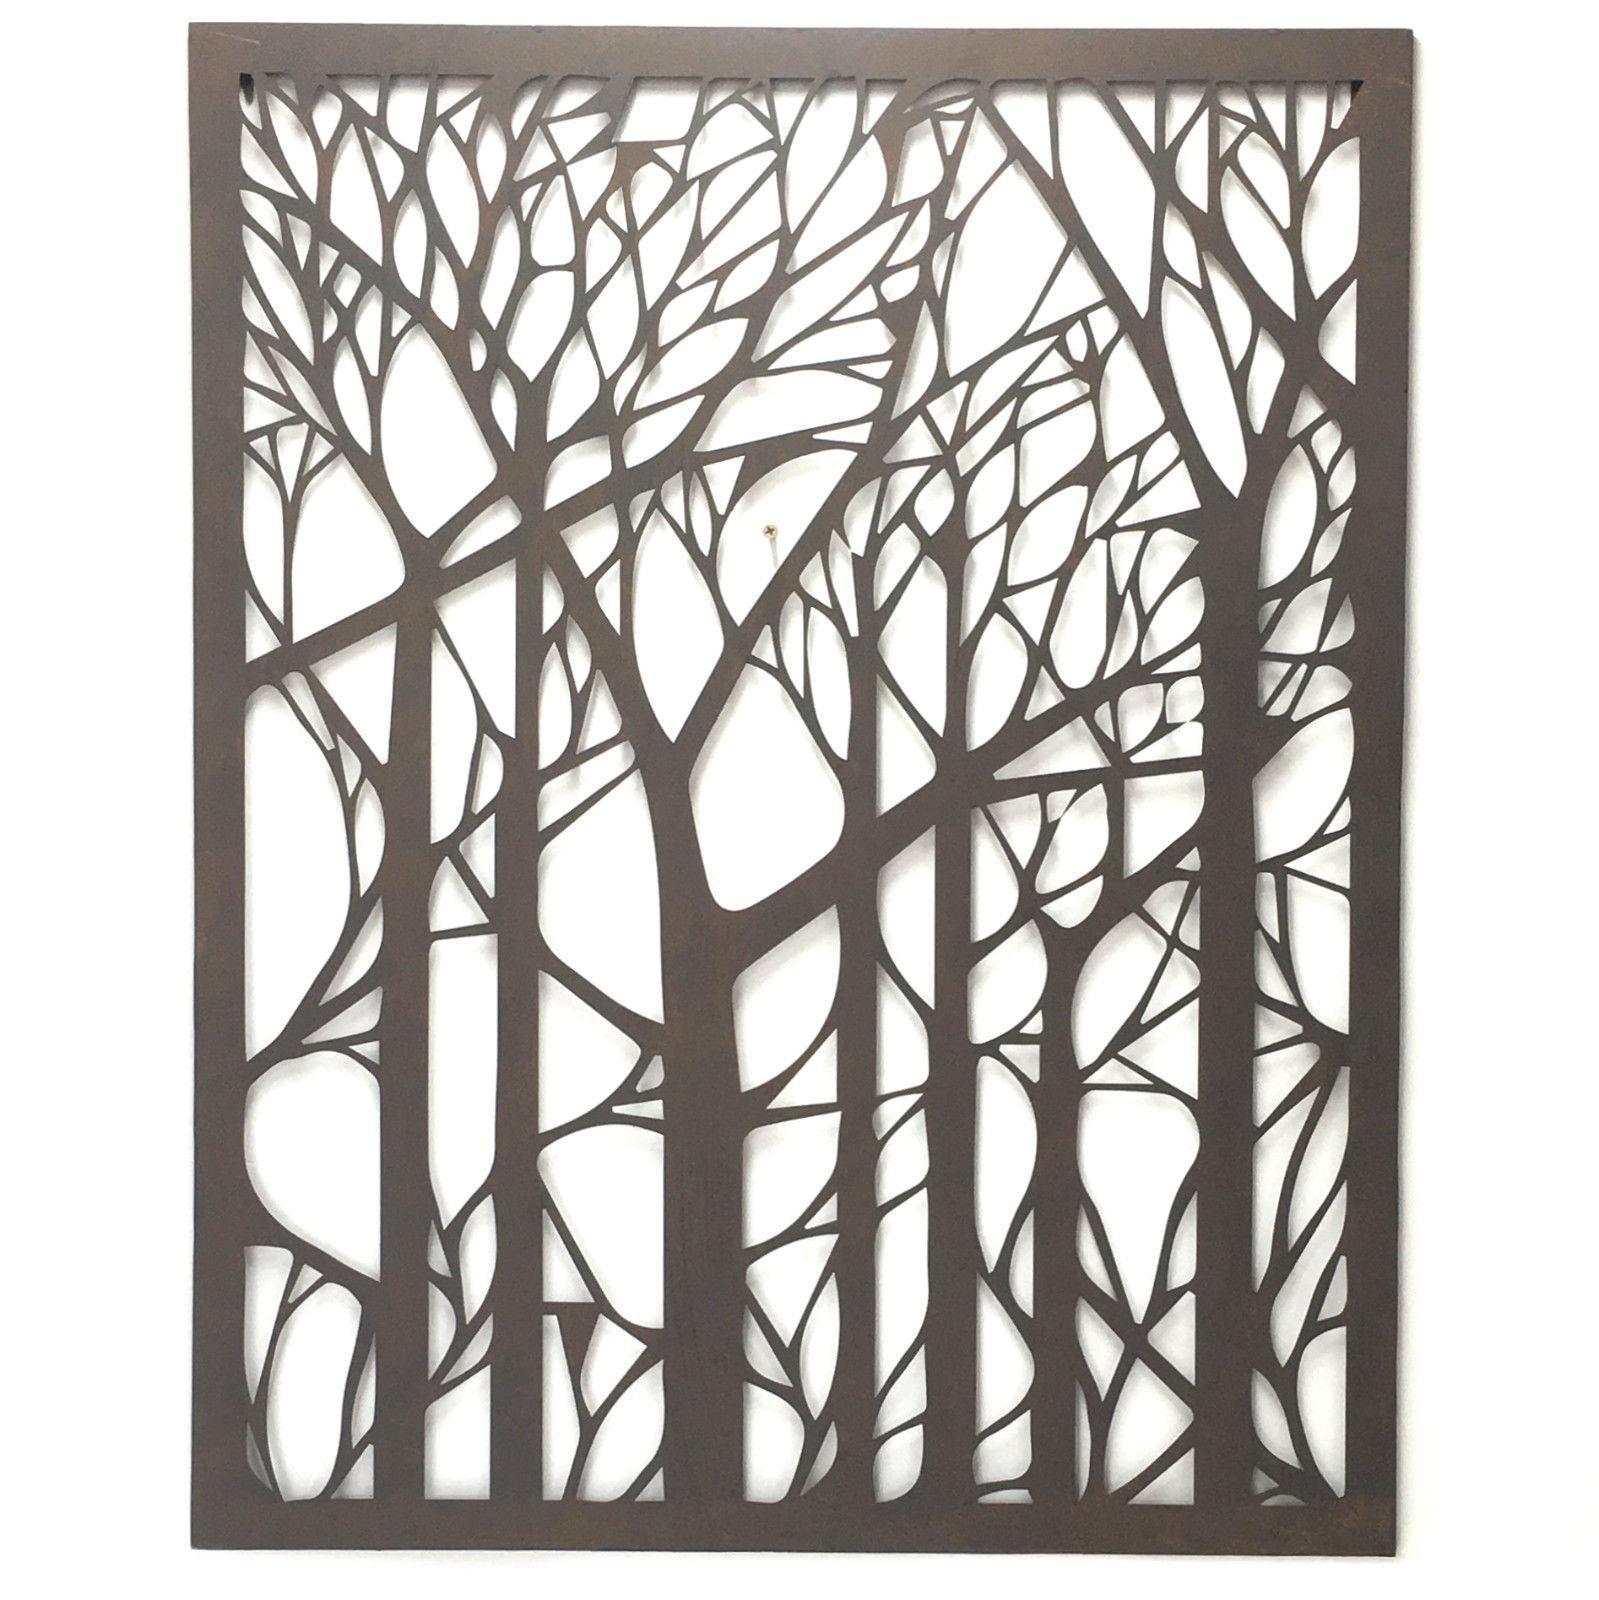 Wall Art Designs: Outdoor Wall Art Metal Tree Metal Wall Art Within Wrought Iron Tree Wall Art (View 18 of 20)